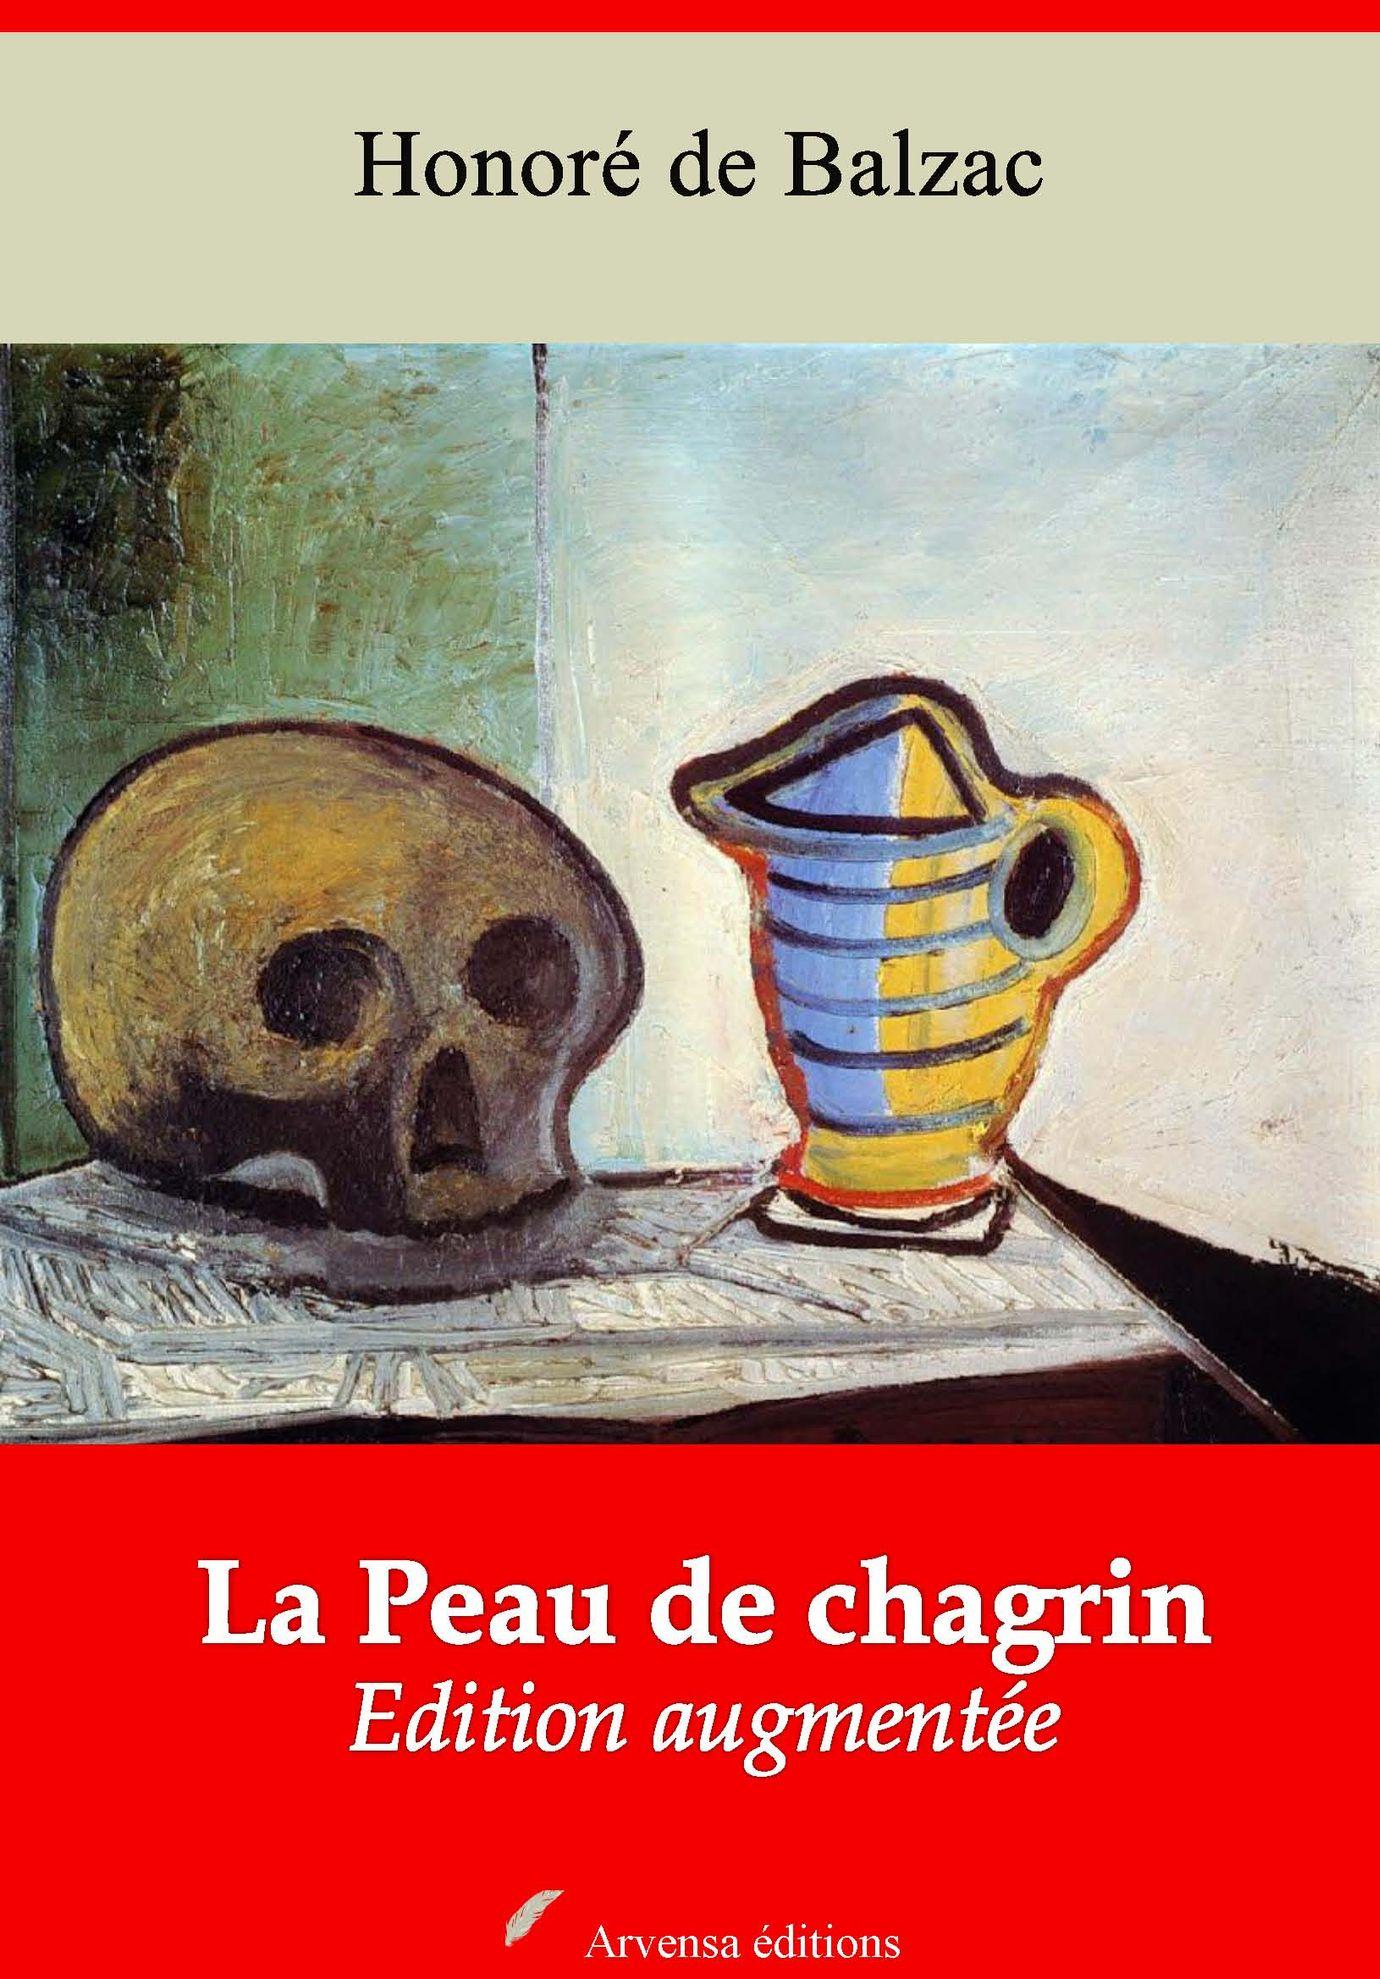 La Peau de chagrin d'Honoré de Balzac Arvensa Editions